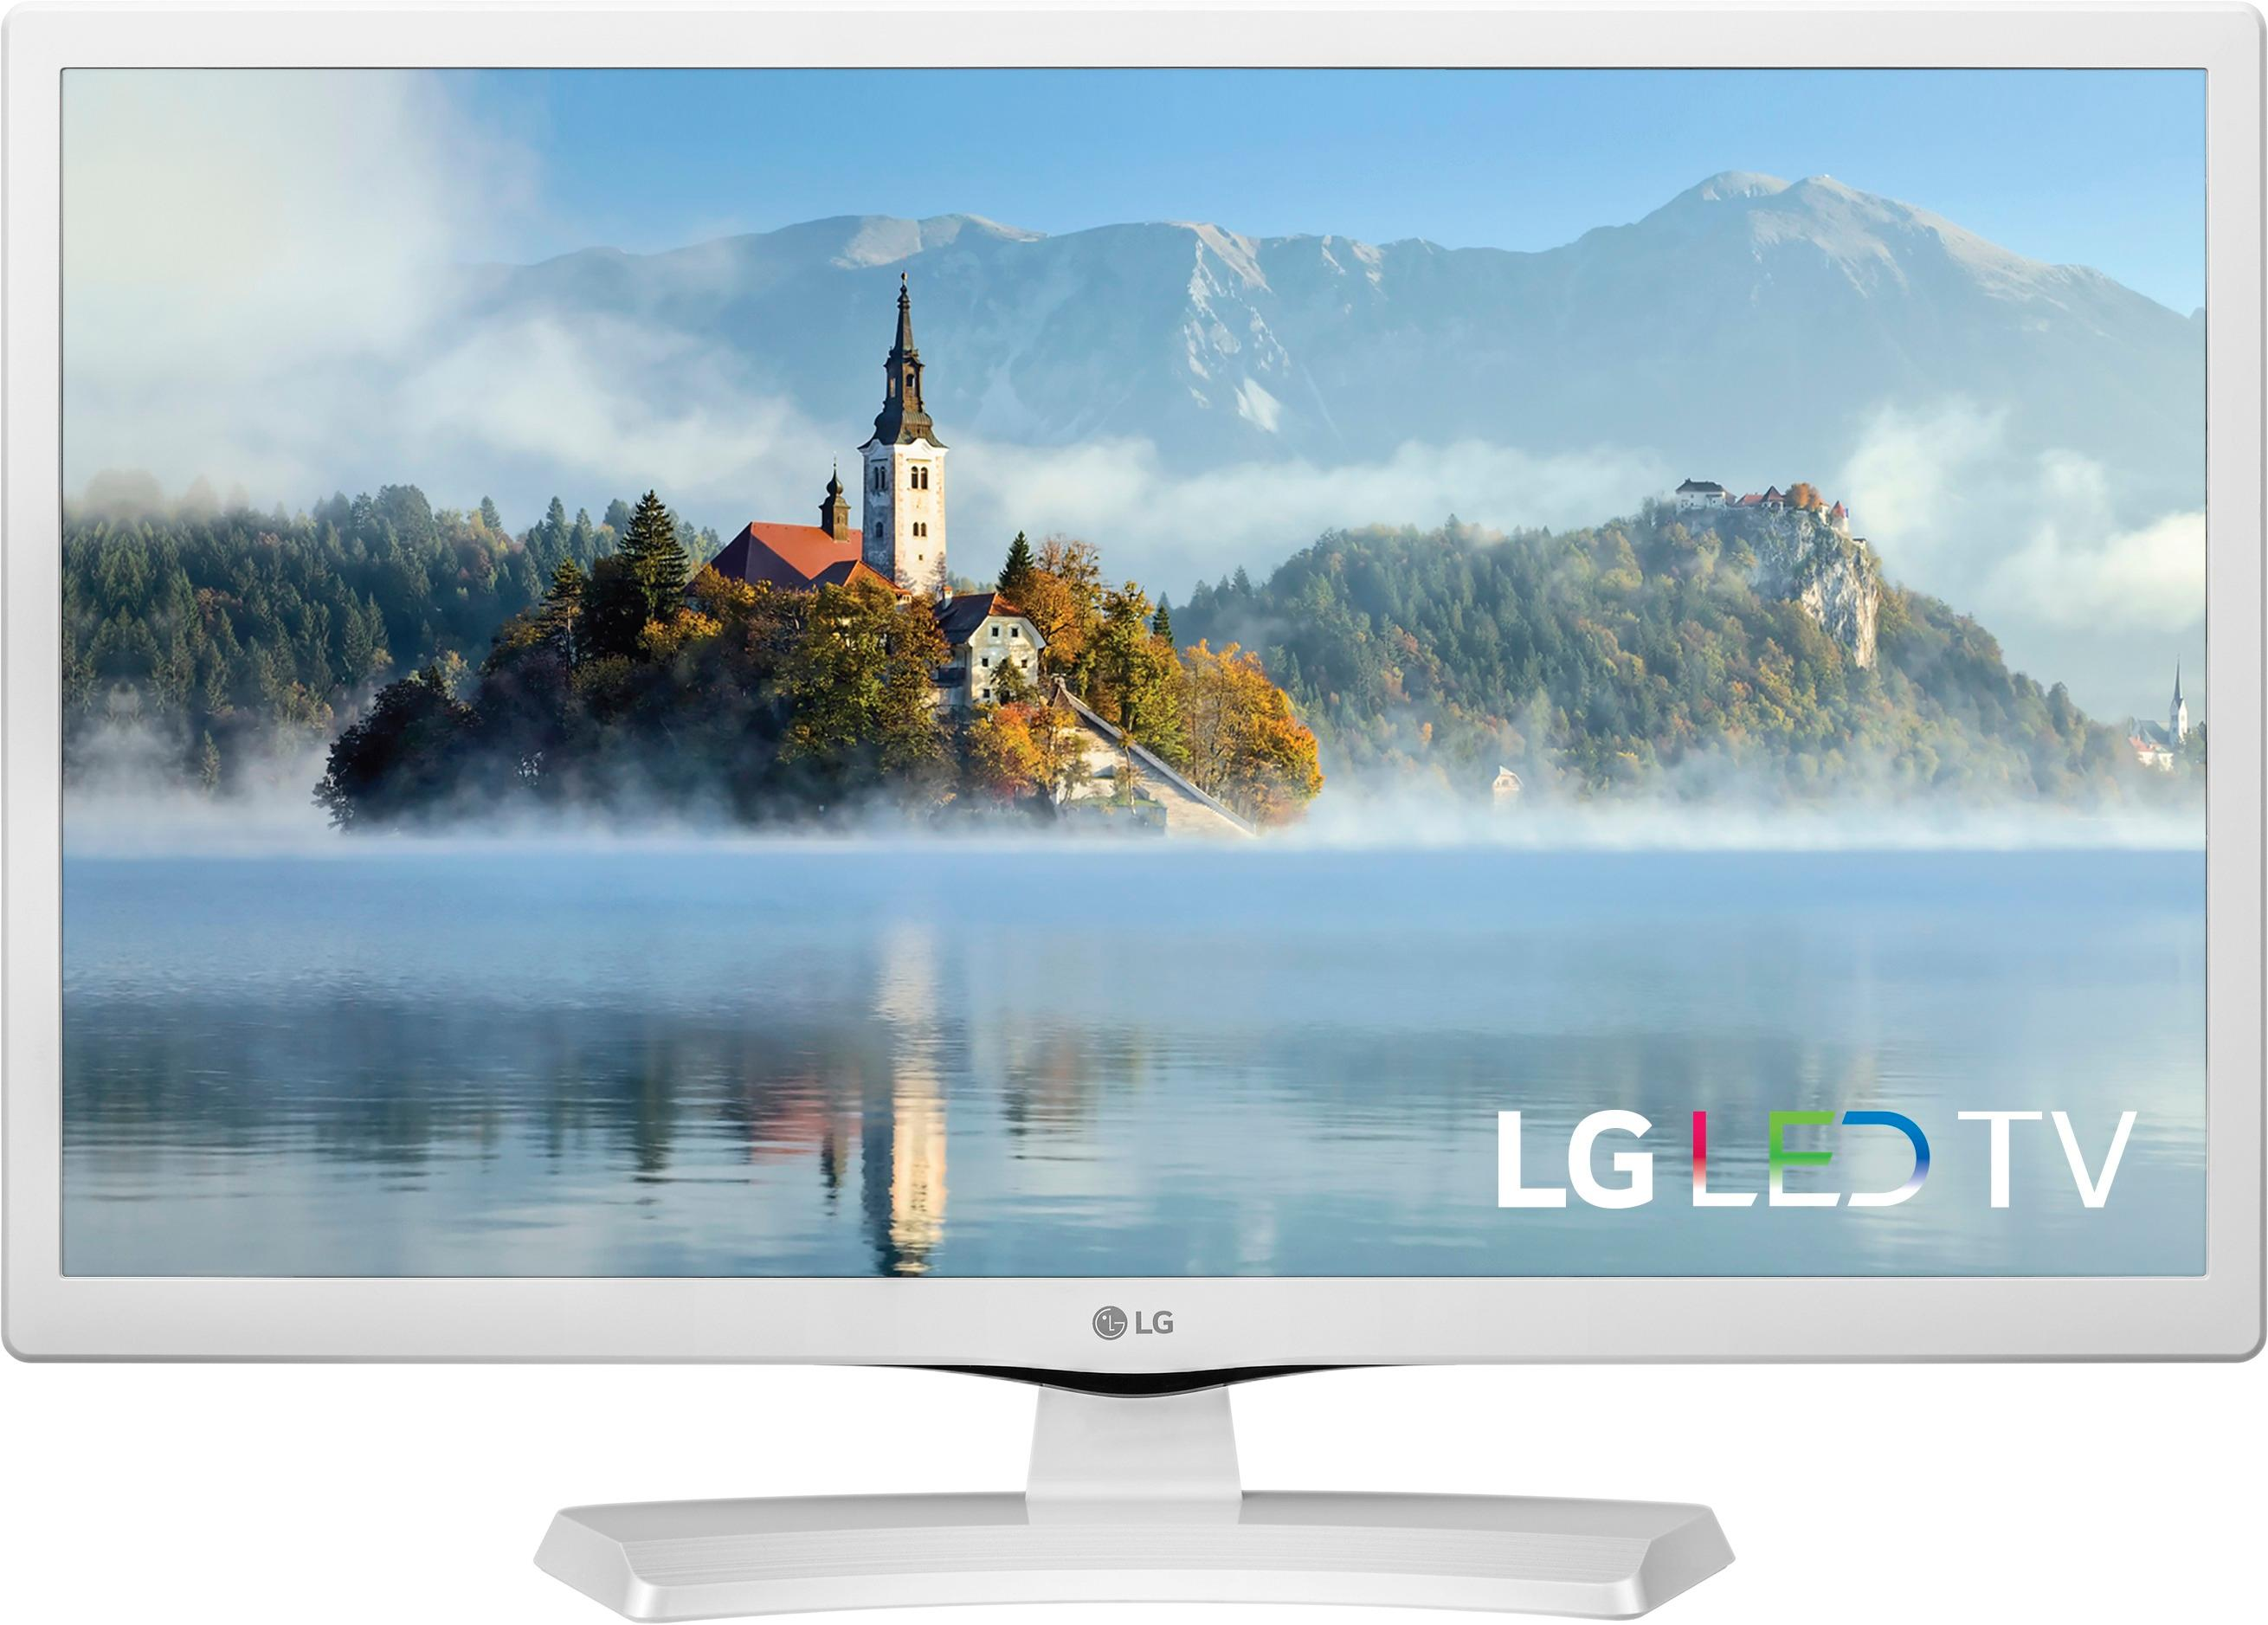 smart tv kitchen window curtain tvs for best buy lg 24 class led 720p hdtv